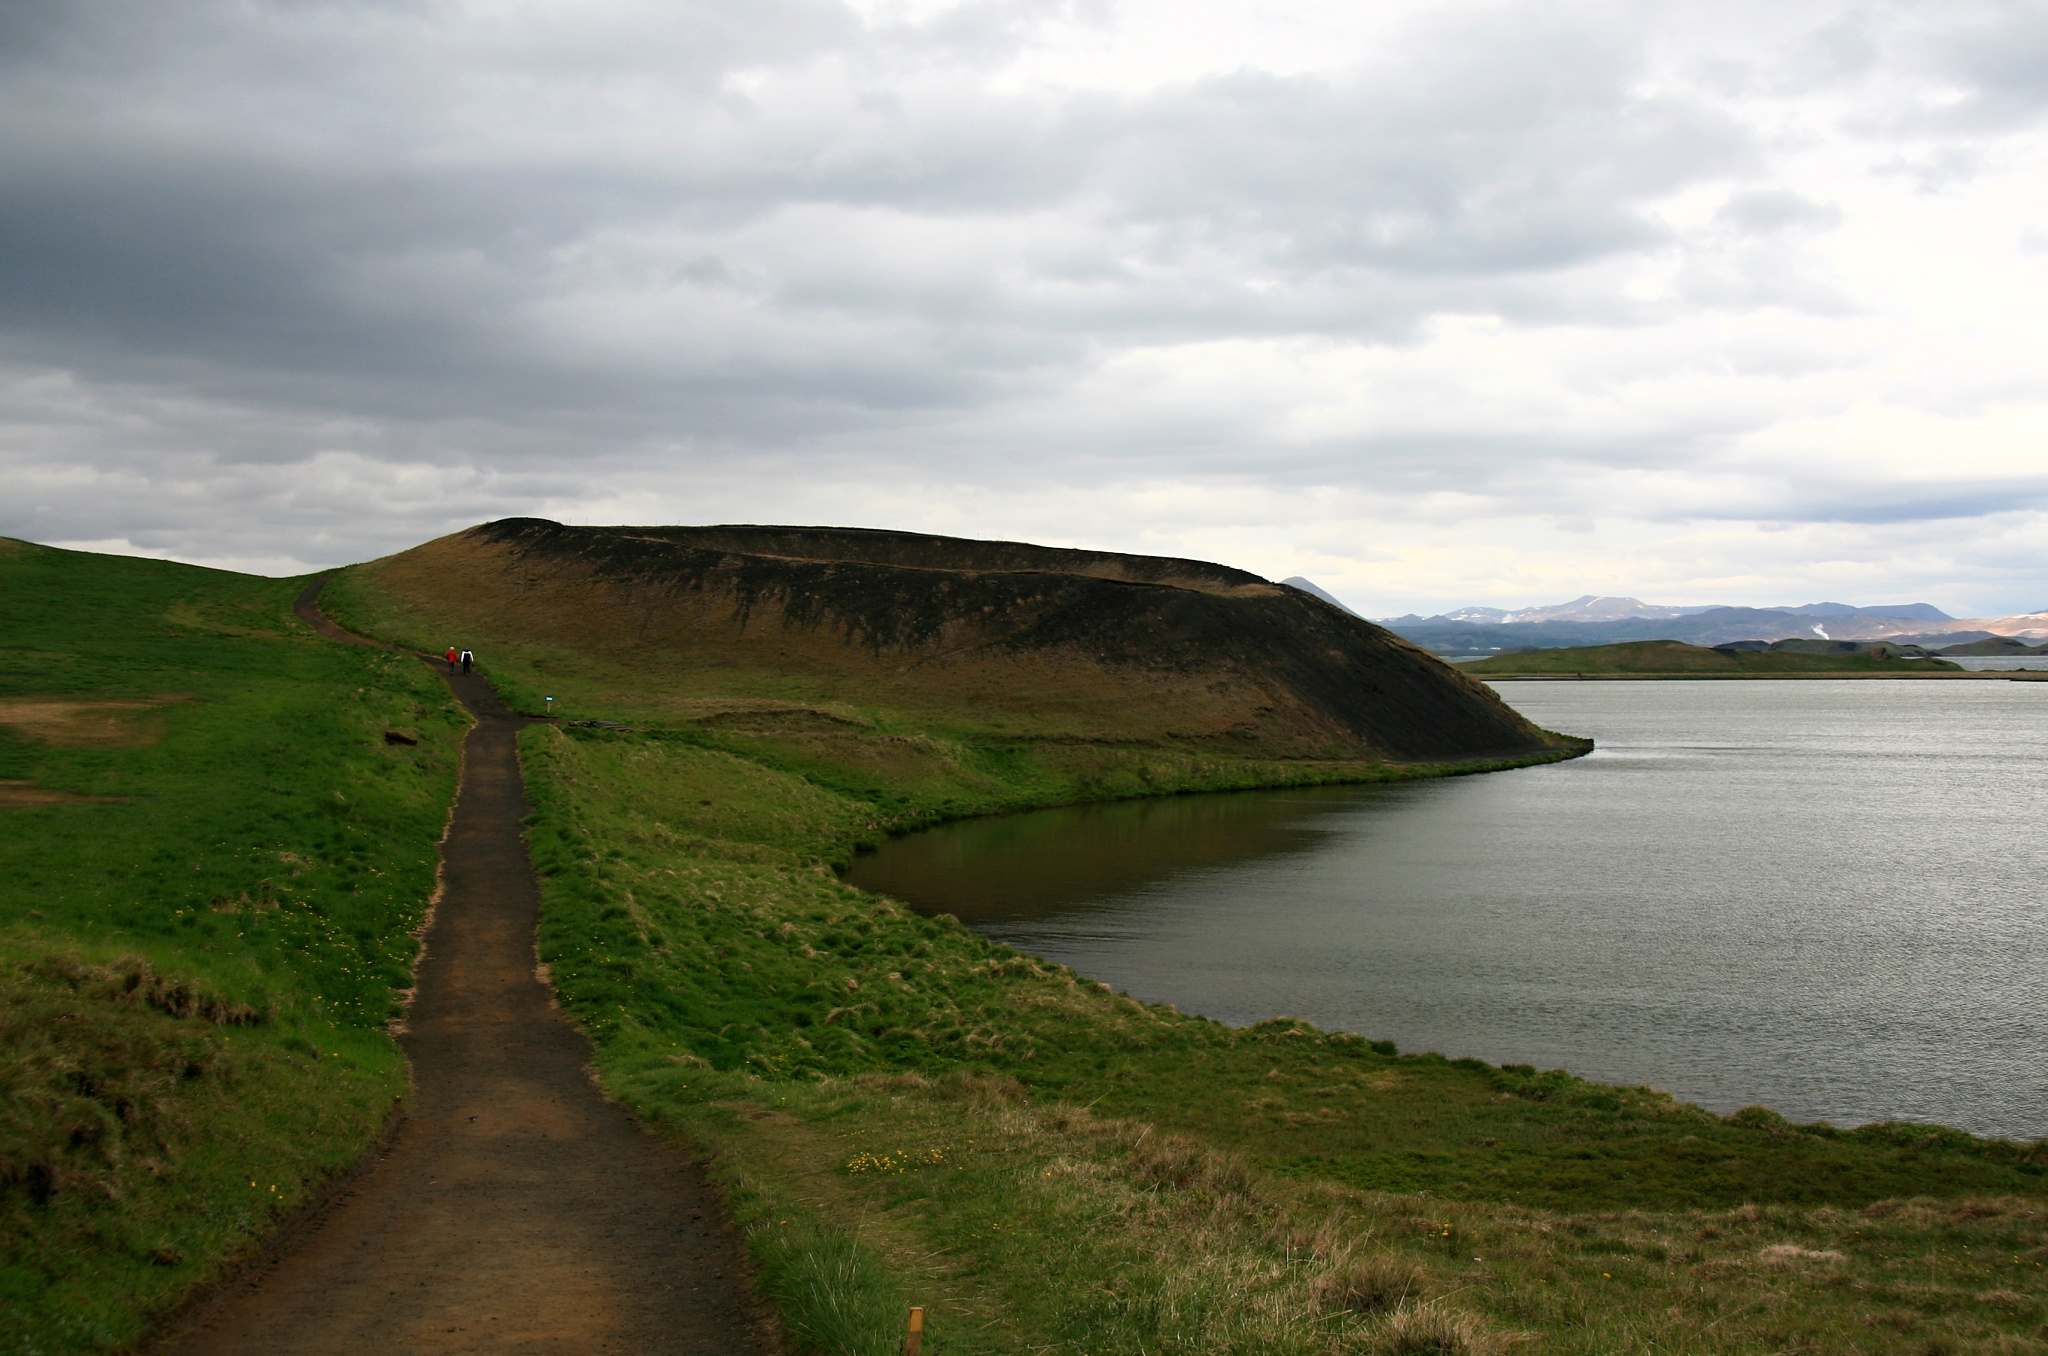 Pseudokráter u jezera Mývatnu